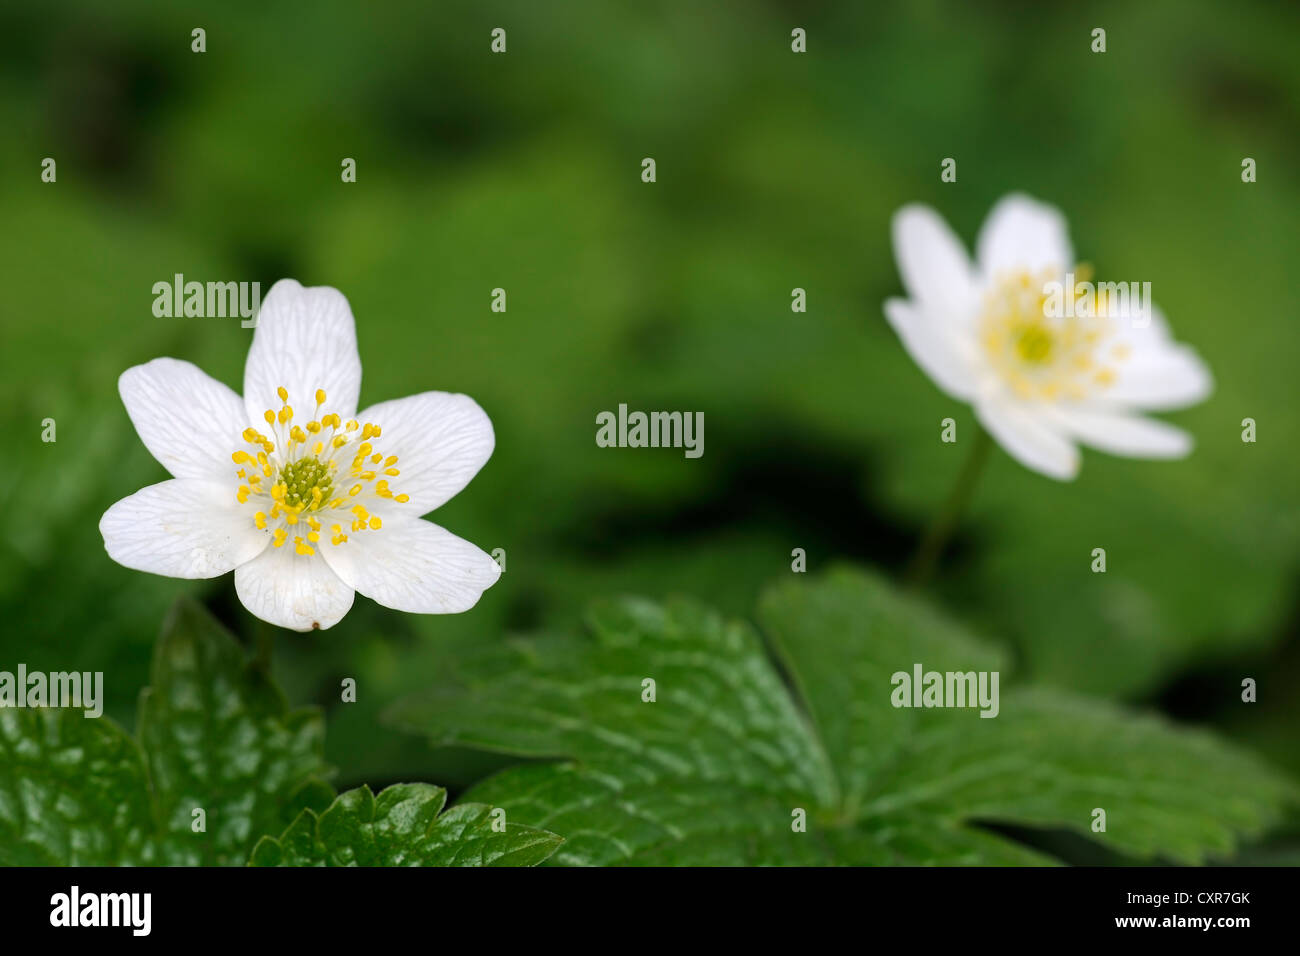 Wood Anemone, Thimbleweed or Smell Fox (Anemone nemorosa), Berlin, Germany, Europe - Stock Image